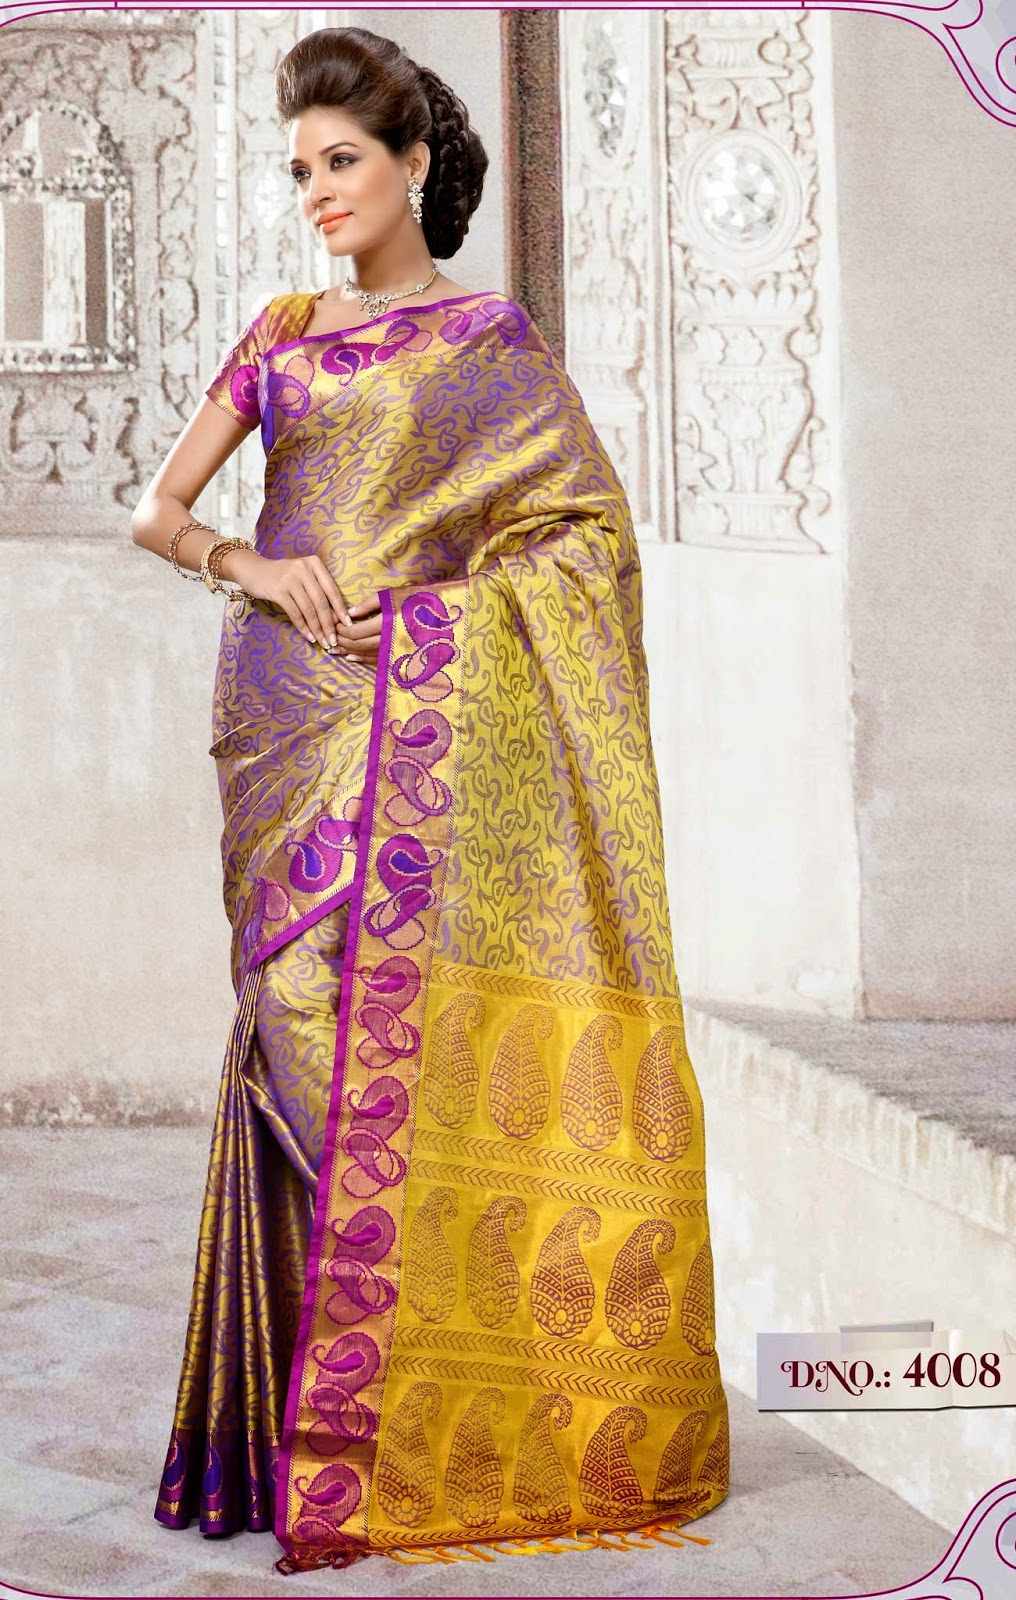 Rangoli Silk Sarees Silks Latest Silk Sarees